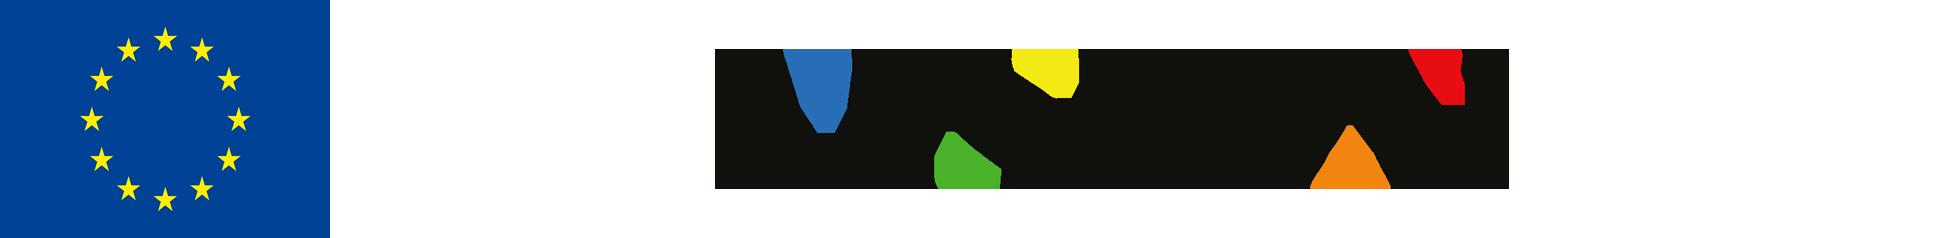 H2020-MSCA-ITN VISION Logo